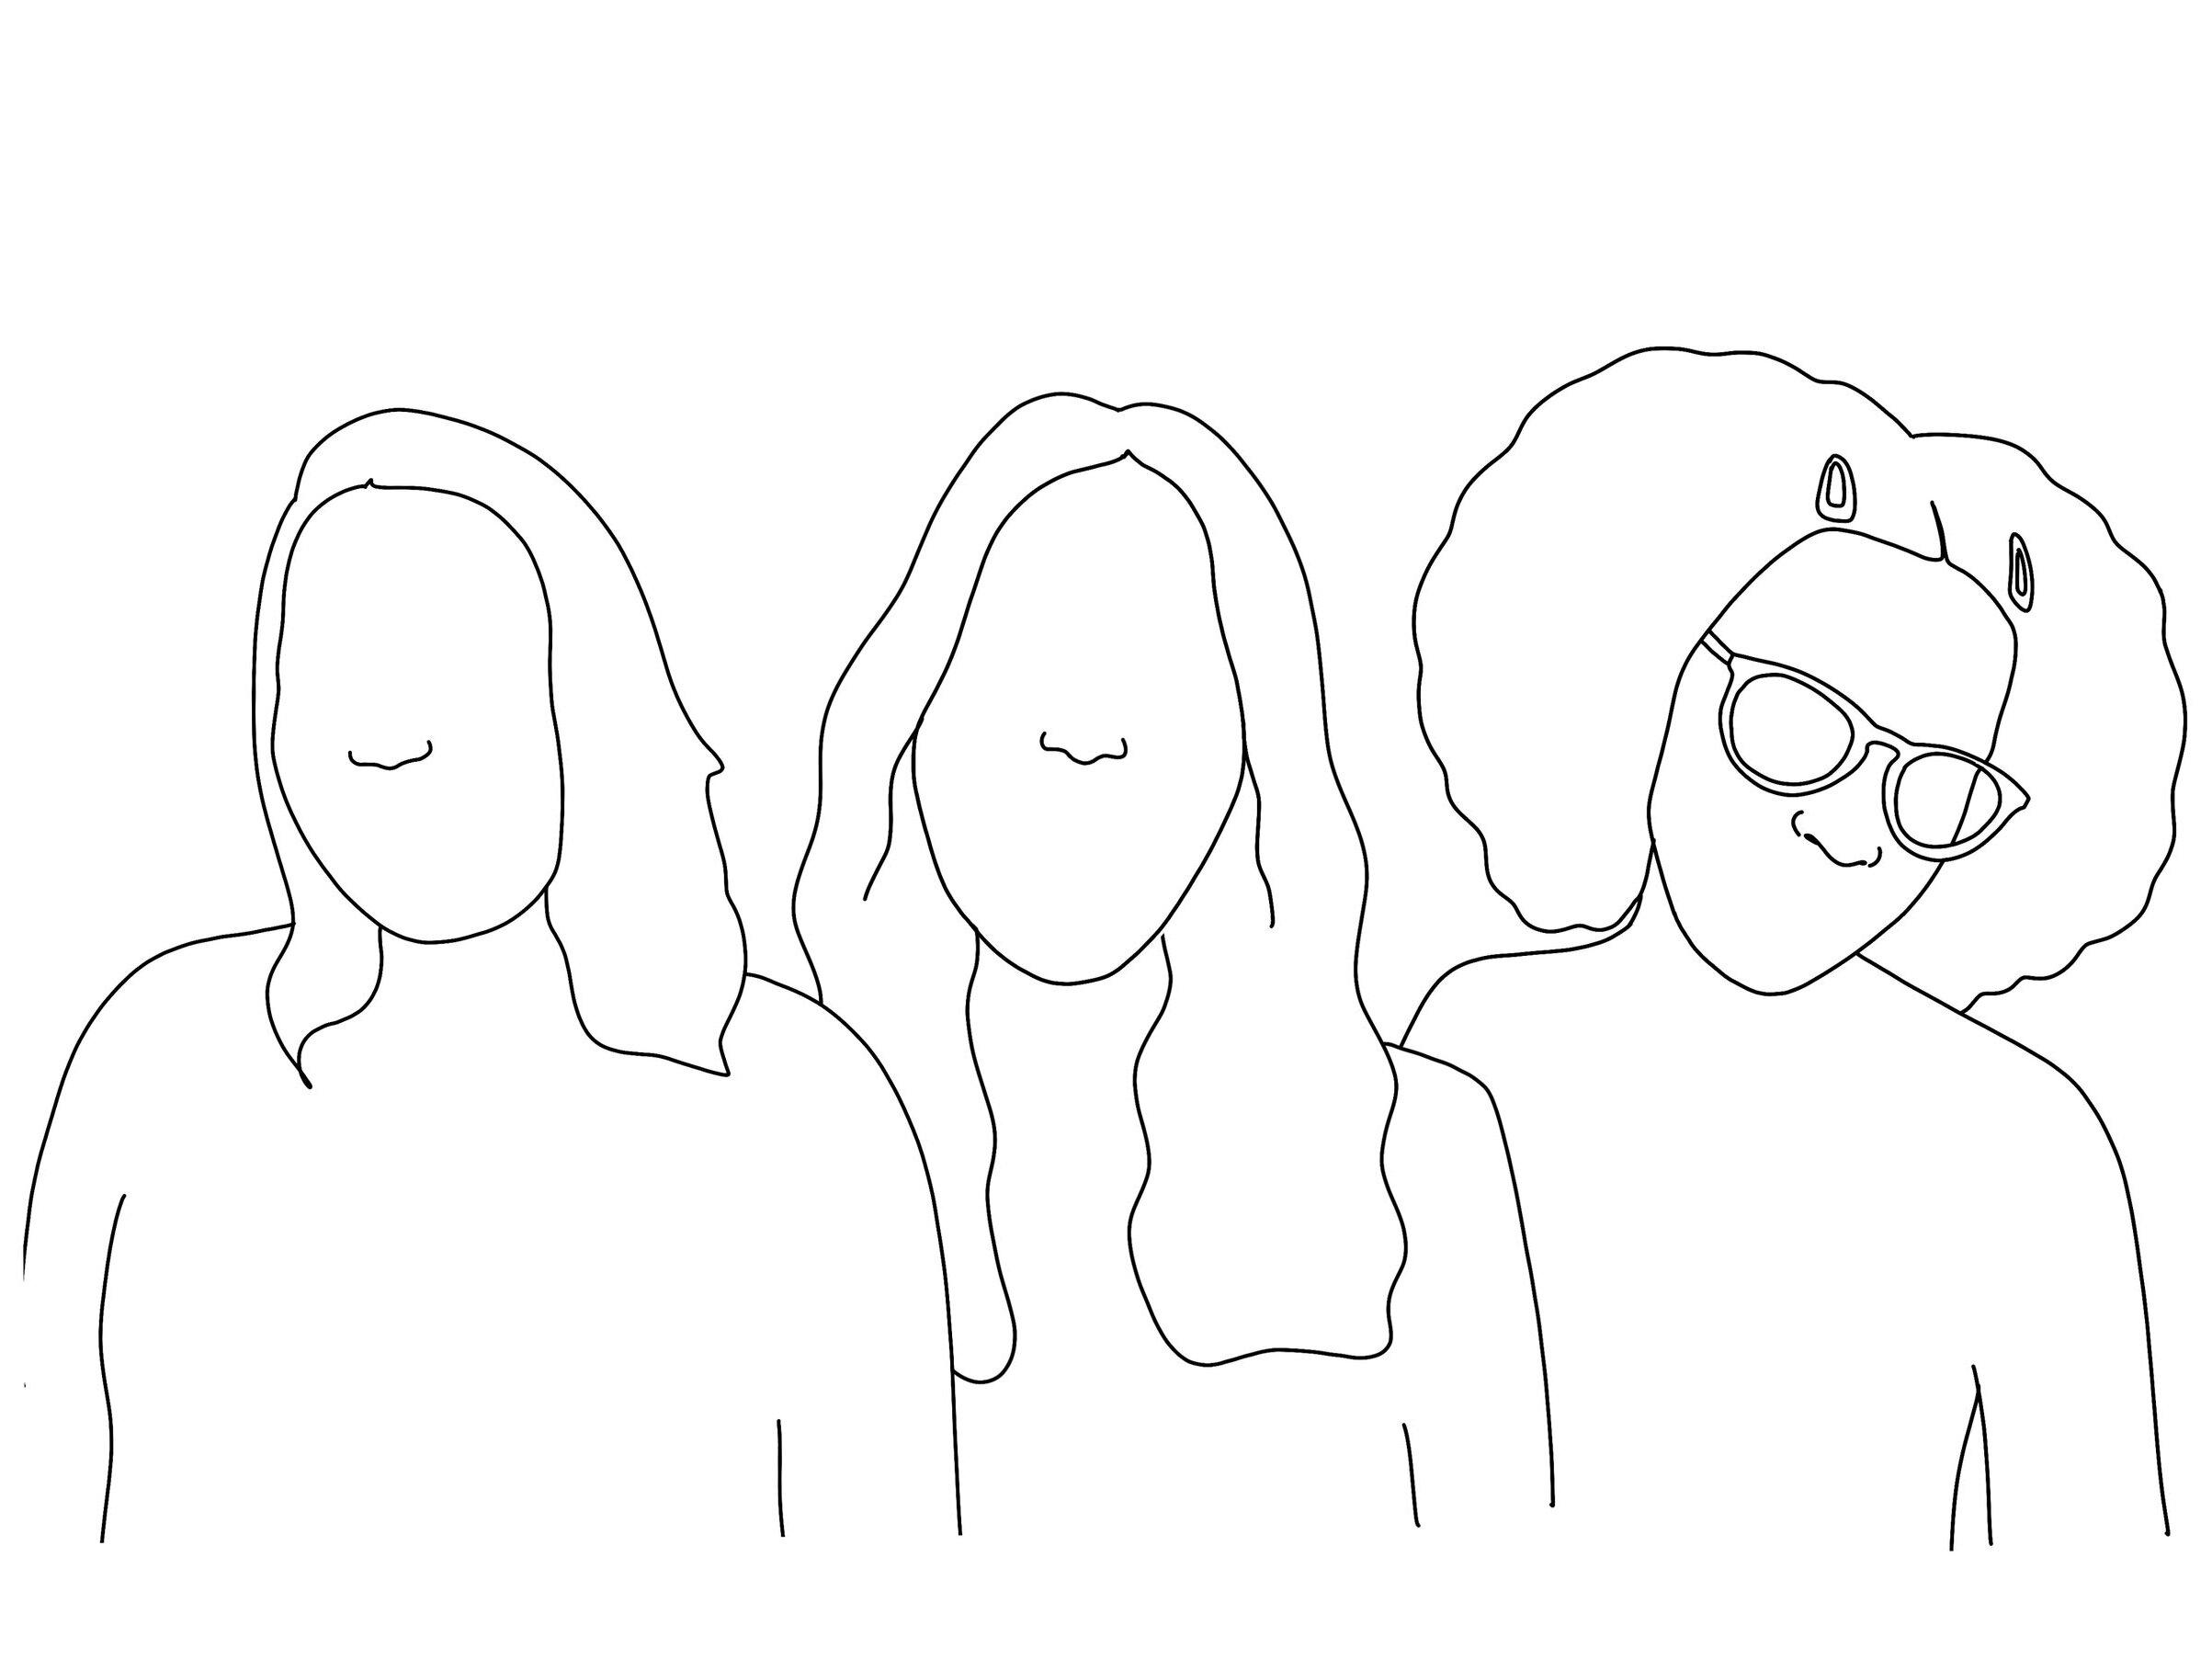 Body Type editors - Sabrina, Ilana, and Heaven. Original illustration by  Caroline Reedy / @doot_doodles